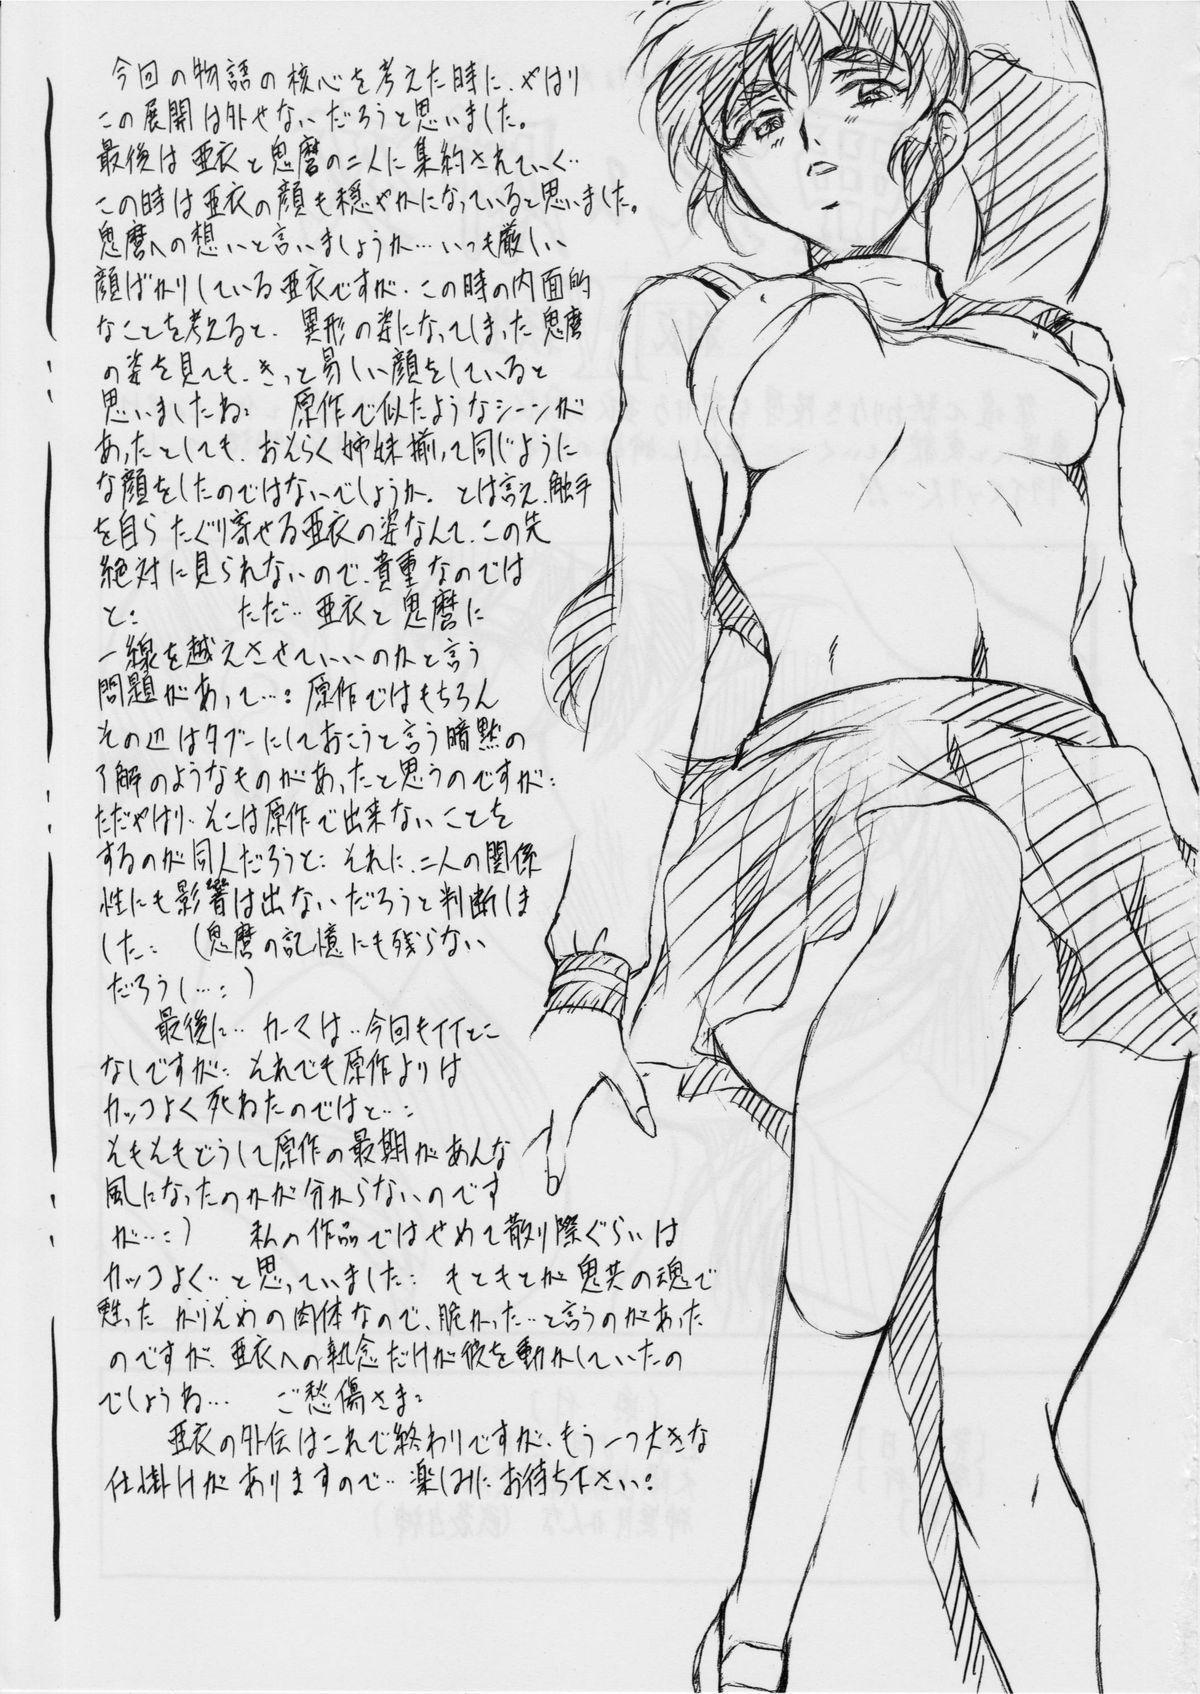 [Busou Megami (Kannaduki Kanna)] Ai & Mai Gaiden -Aoki Seido-Kouhen- (Inju Seisen Twin Angels) 33